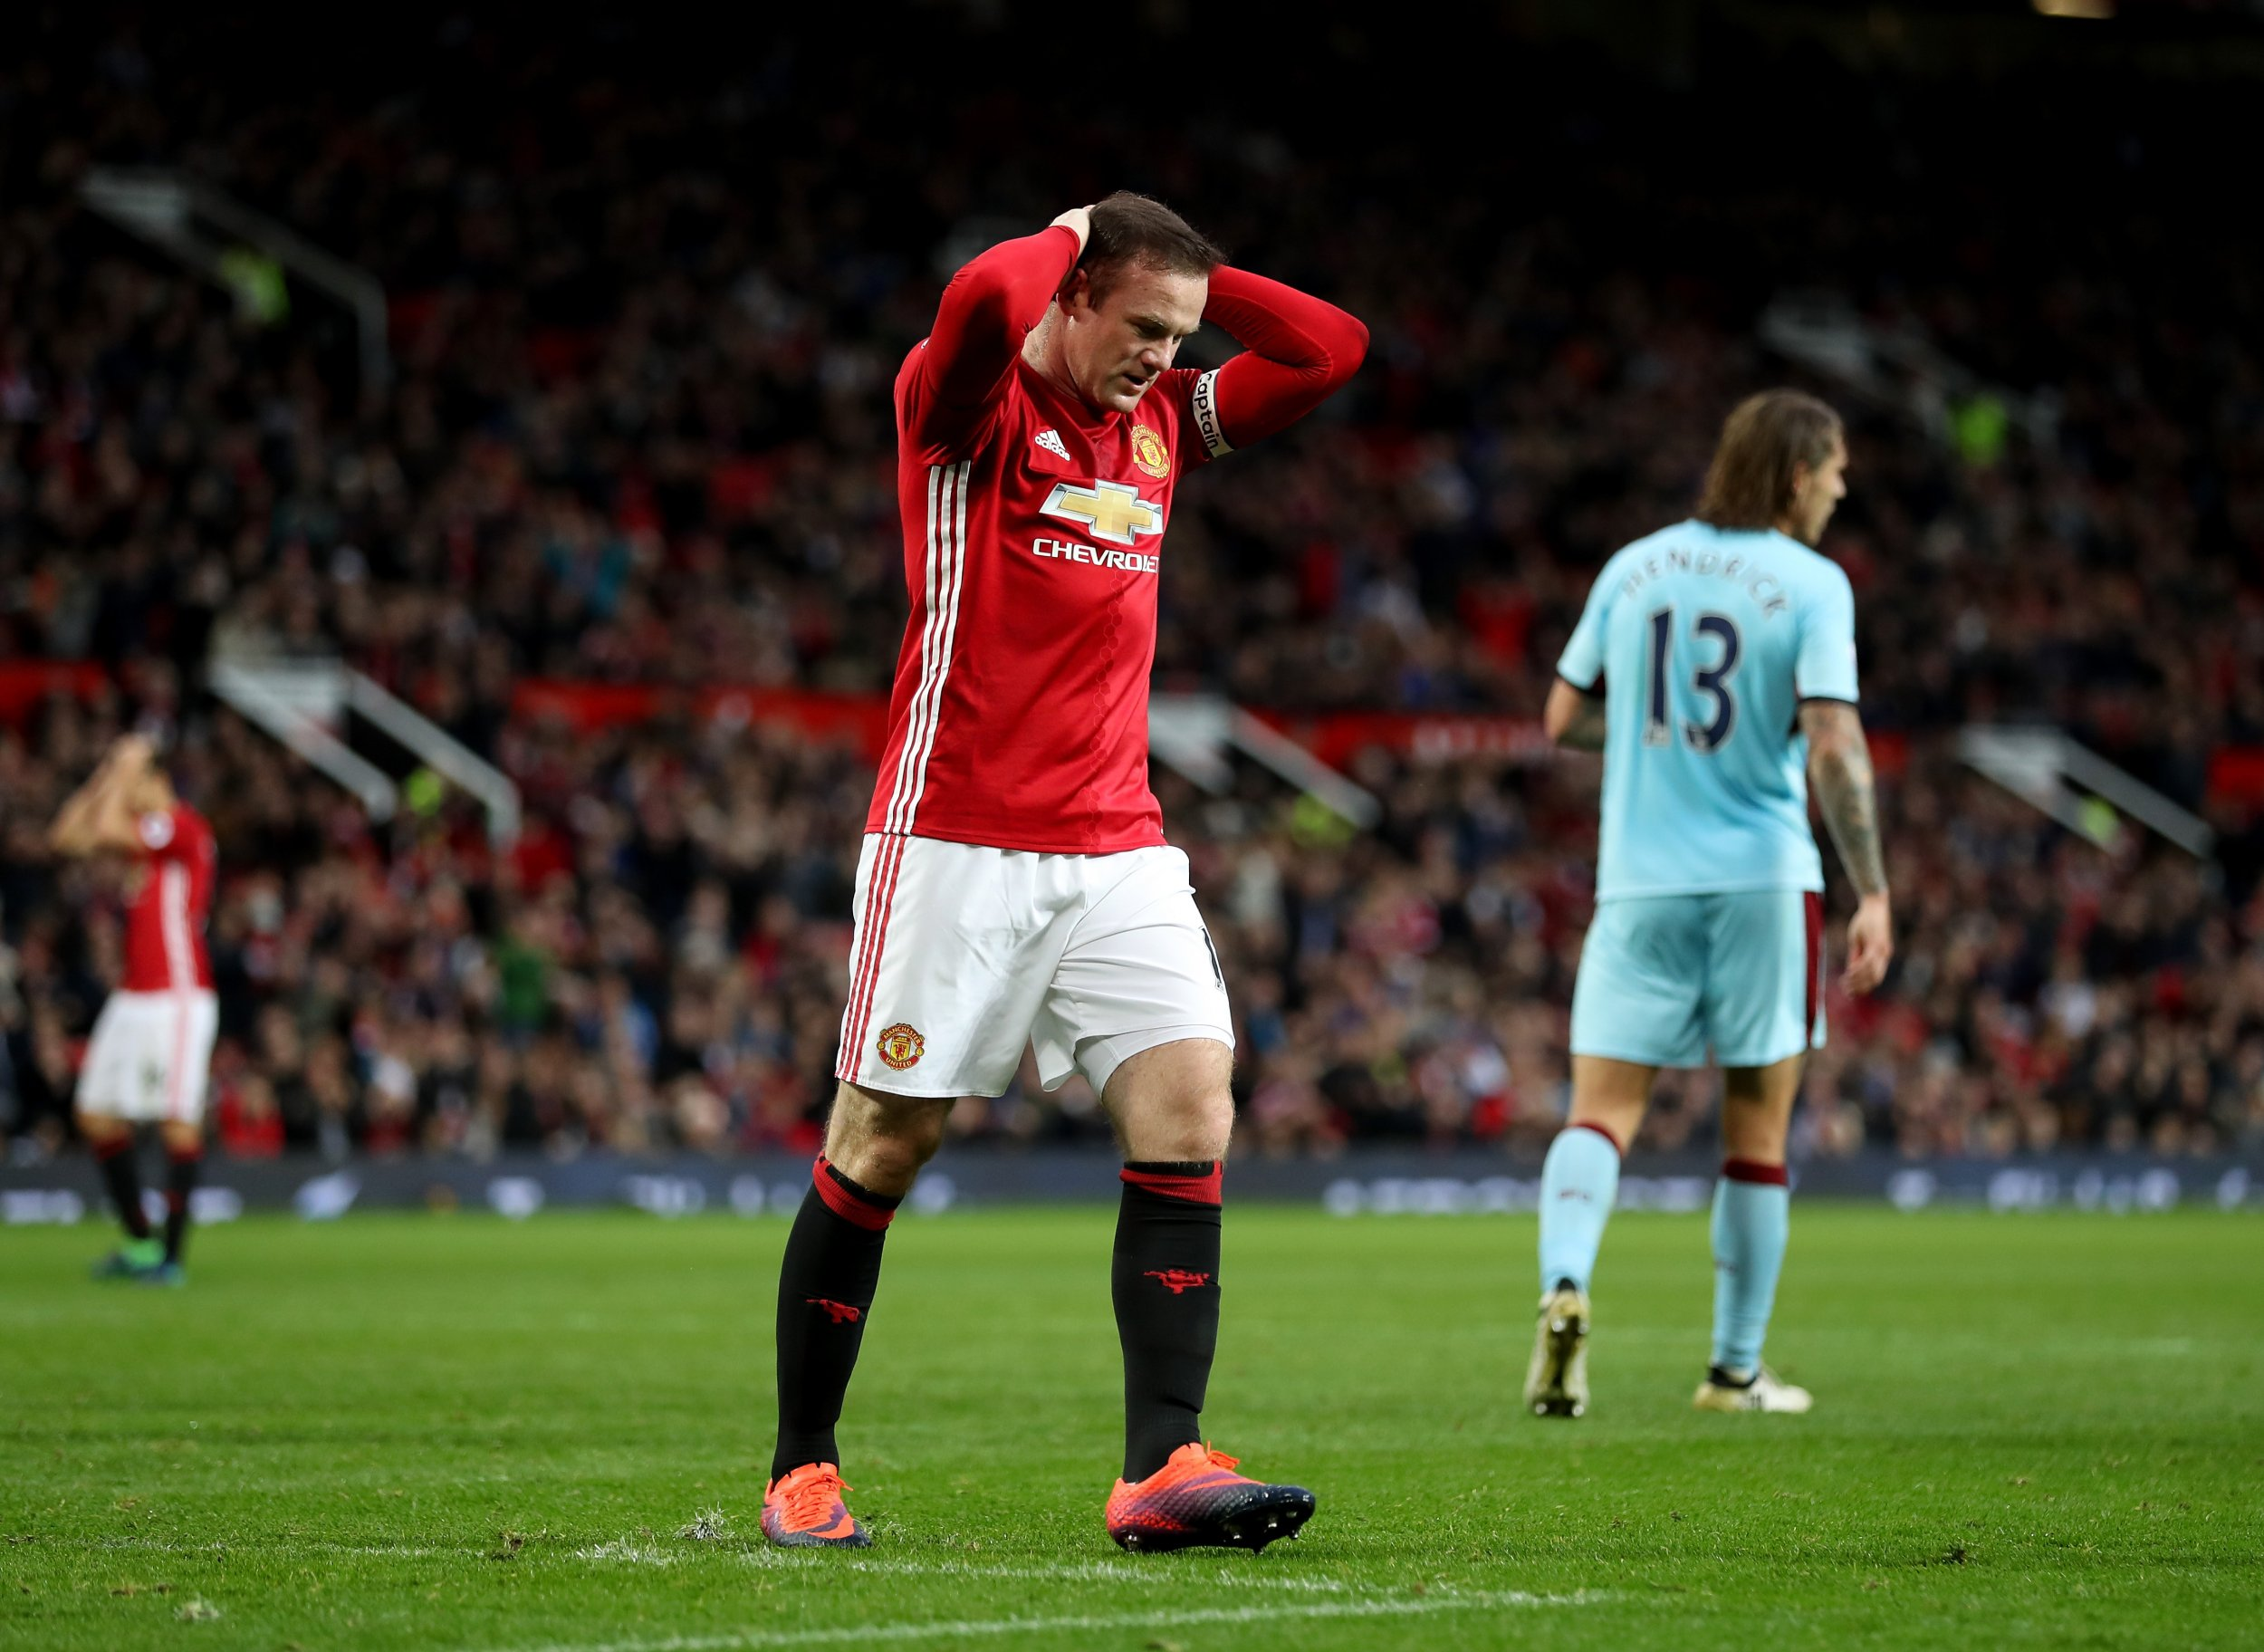 Manchester United striker Wayne Rooney.